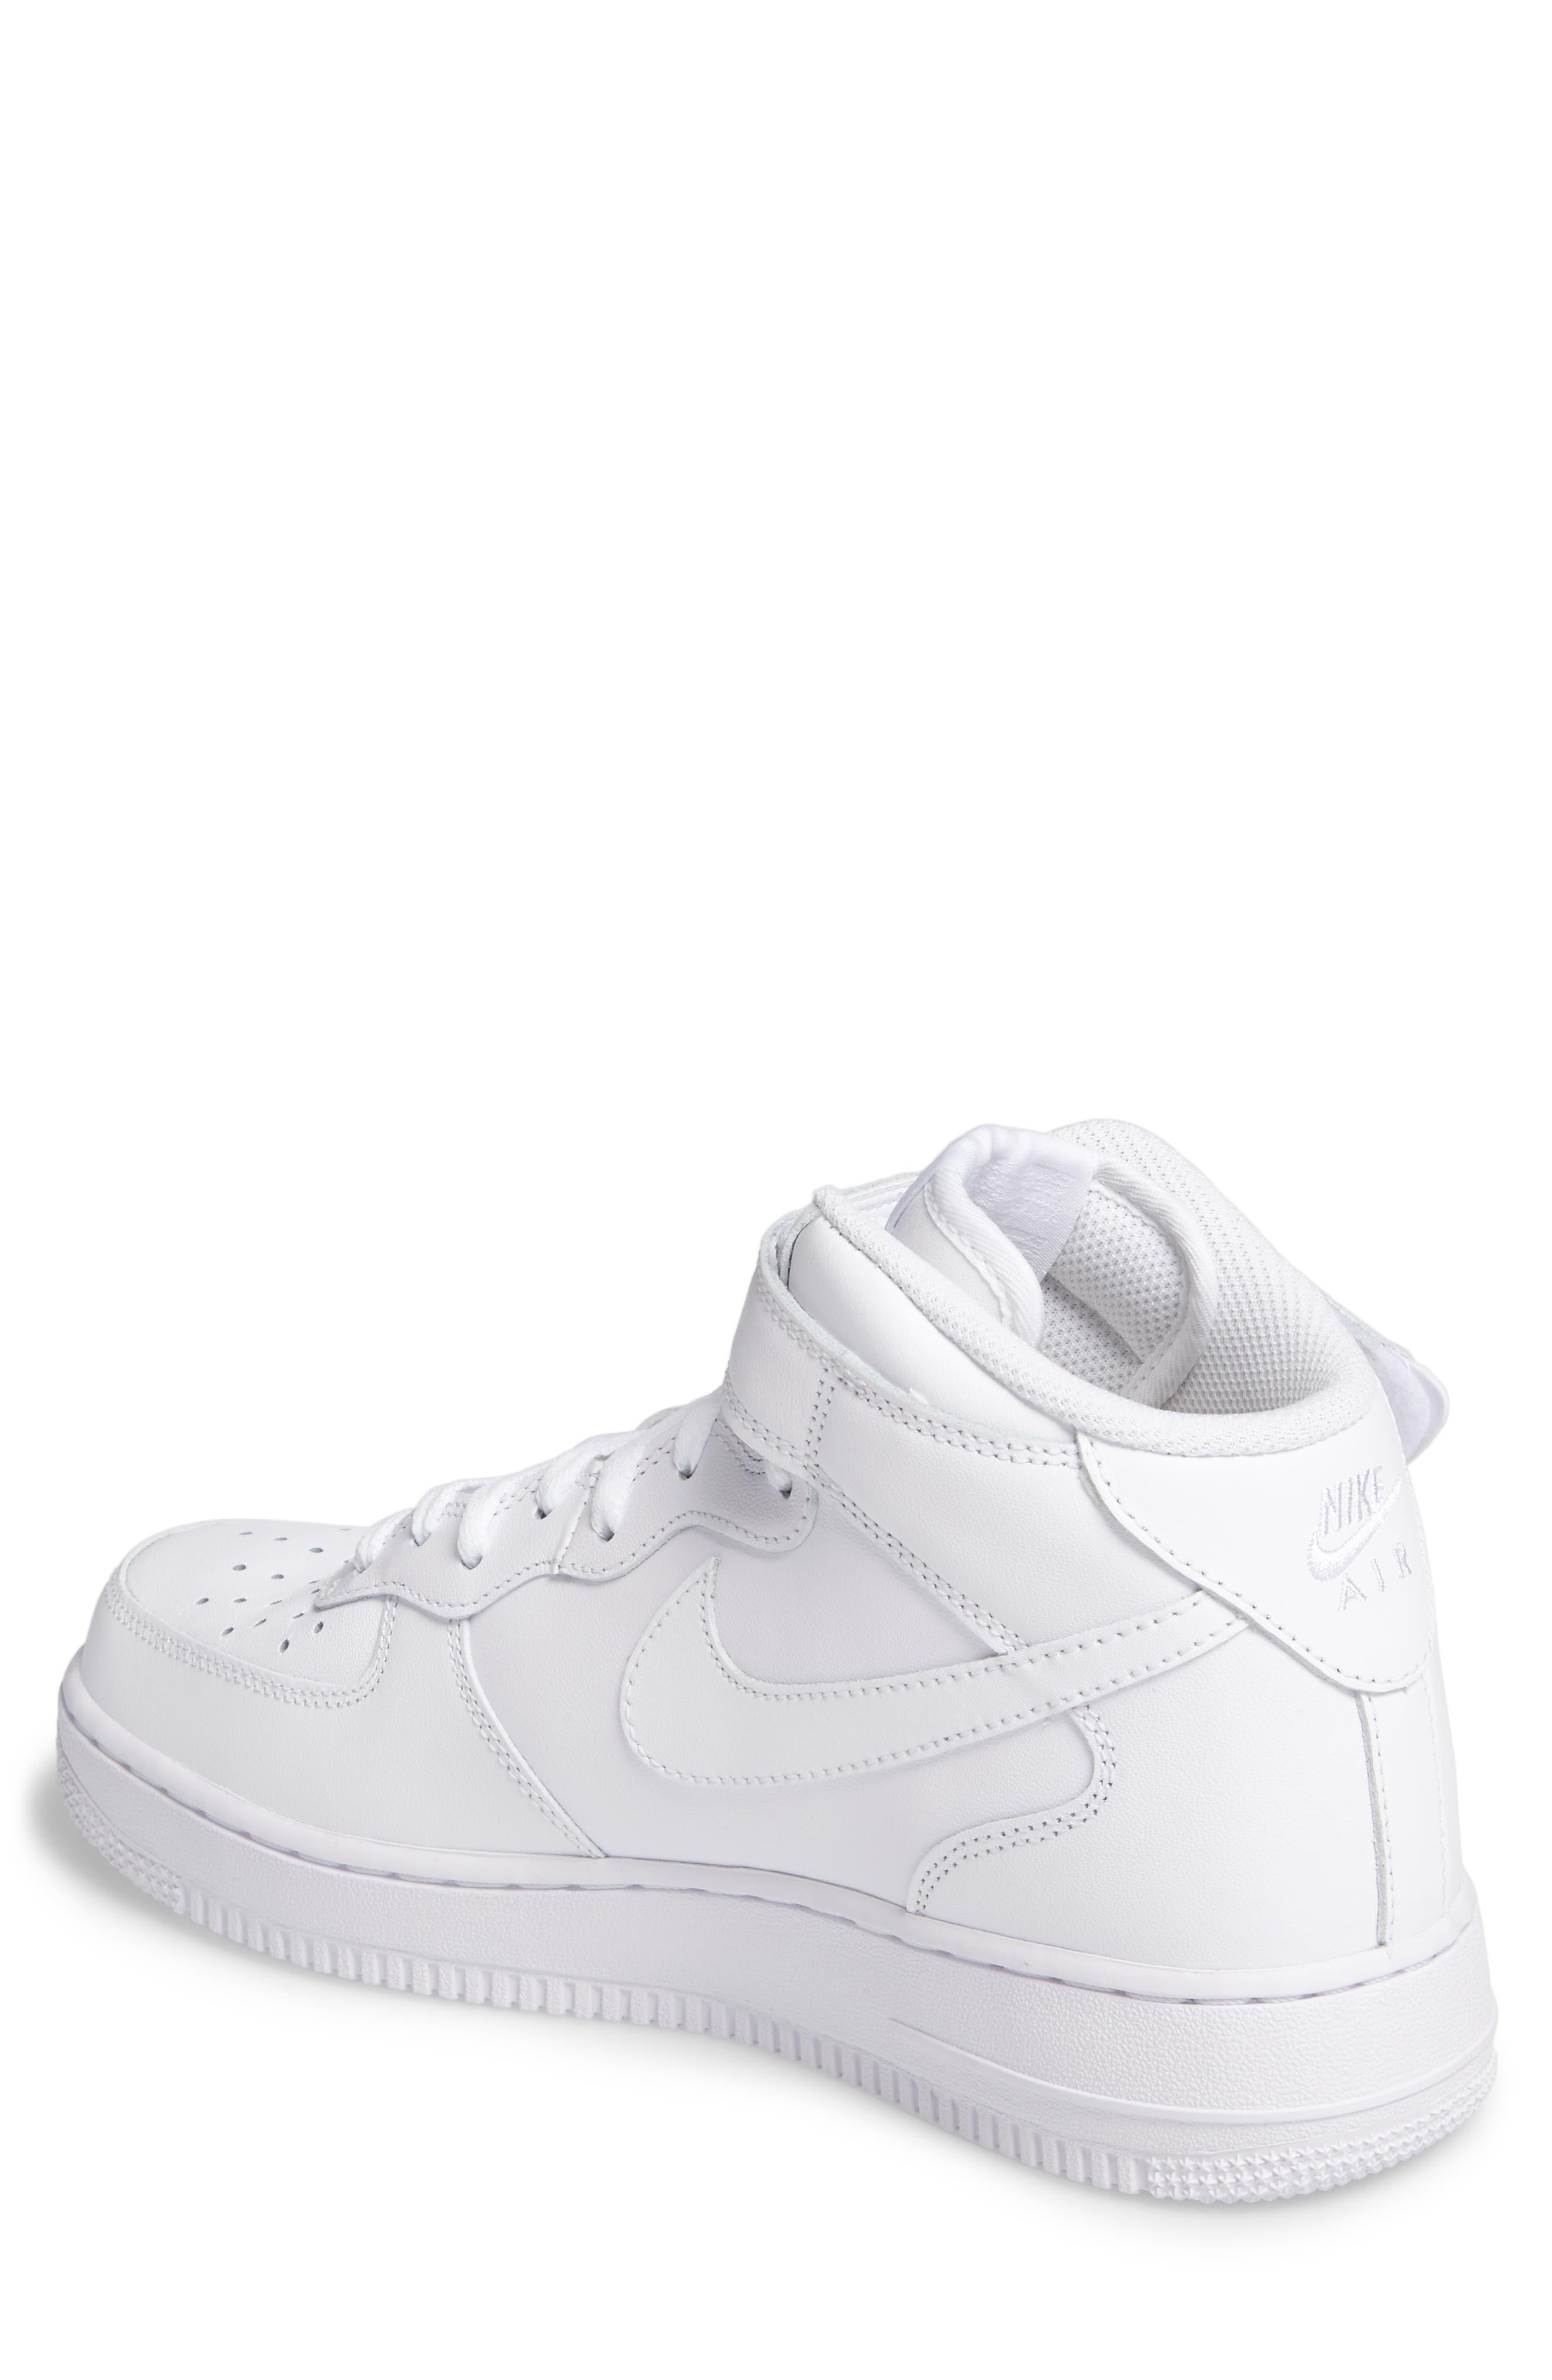 Air Force 1 Mid '07 Sneaker,                             Alternate thumbnail 2, color,                             White/ White